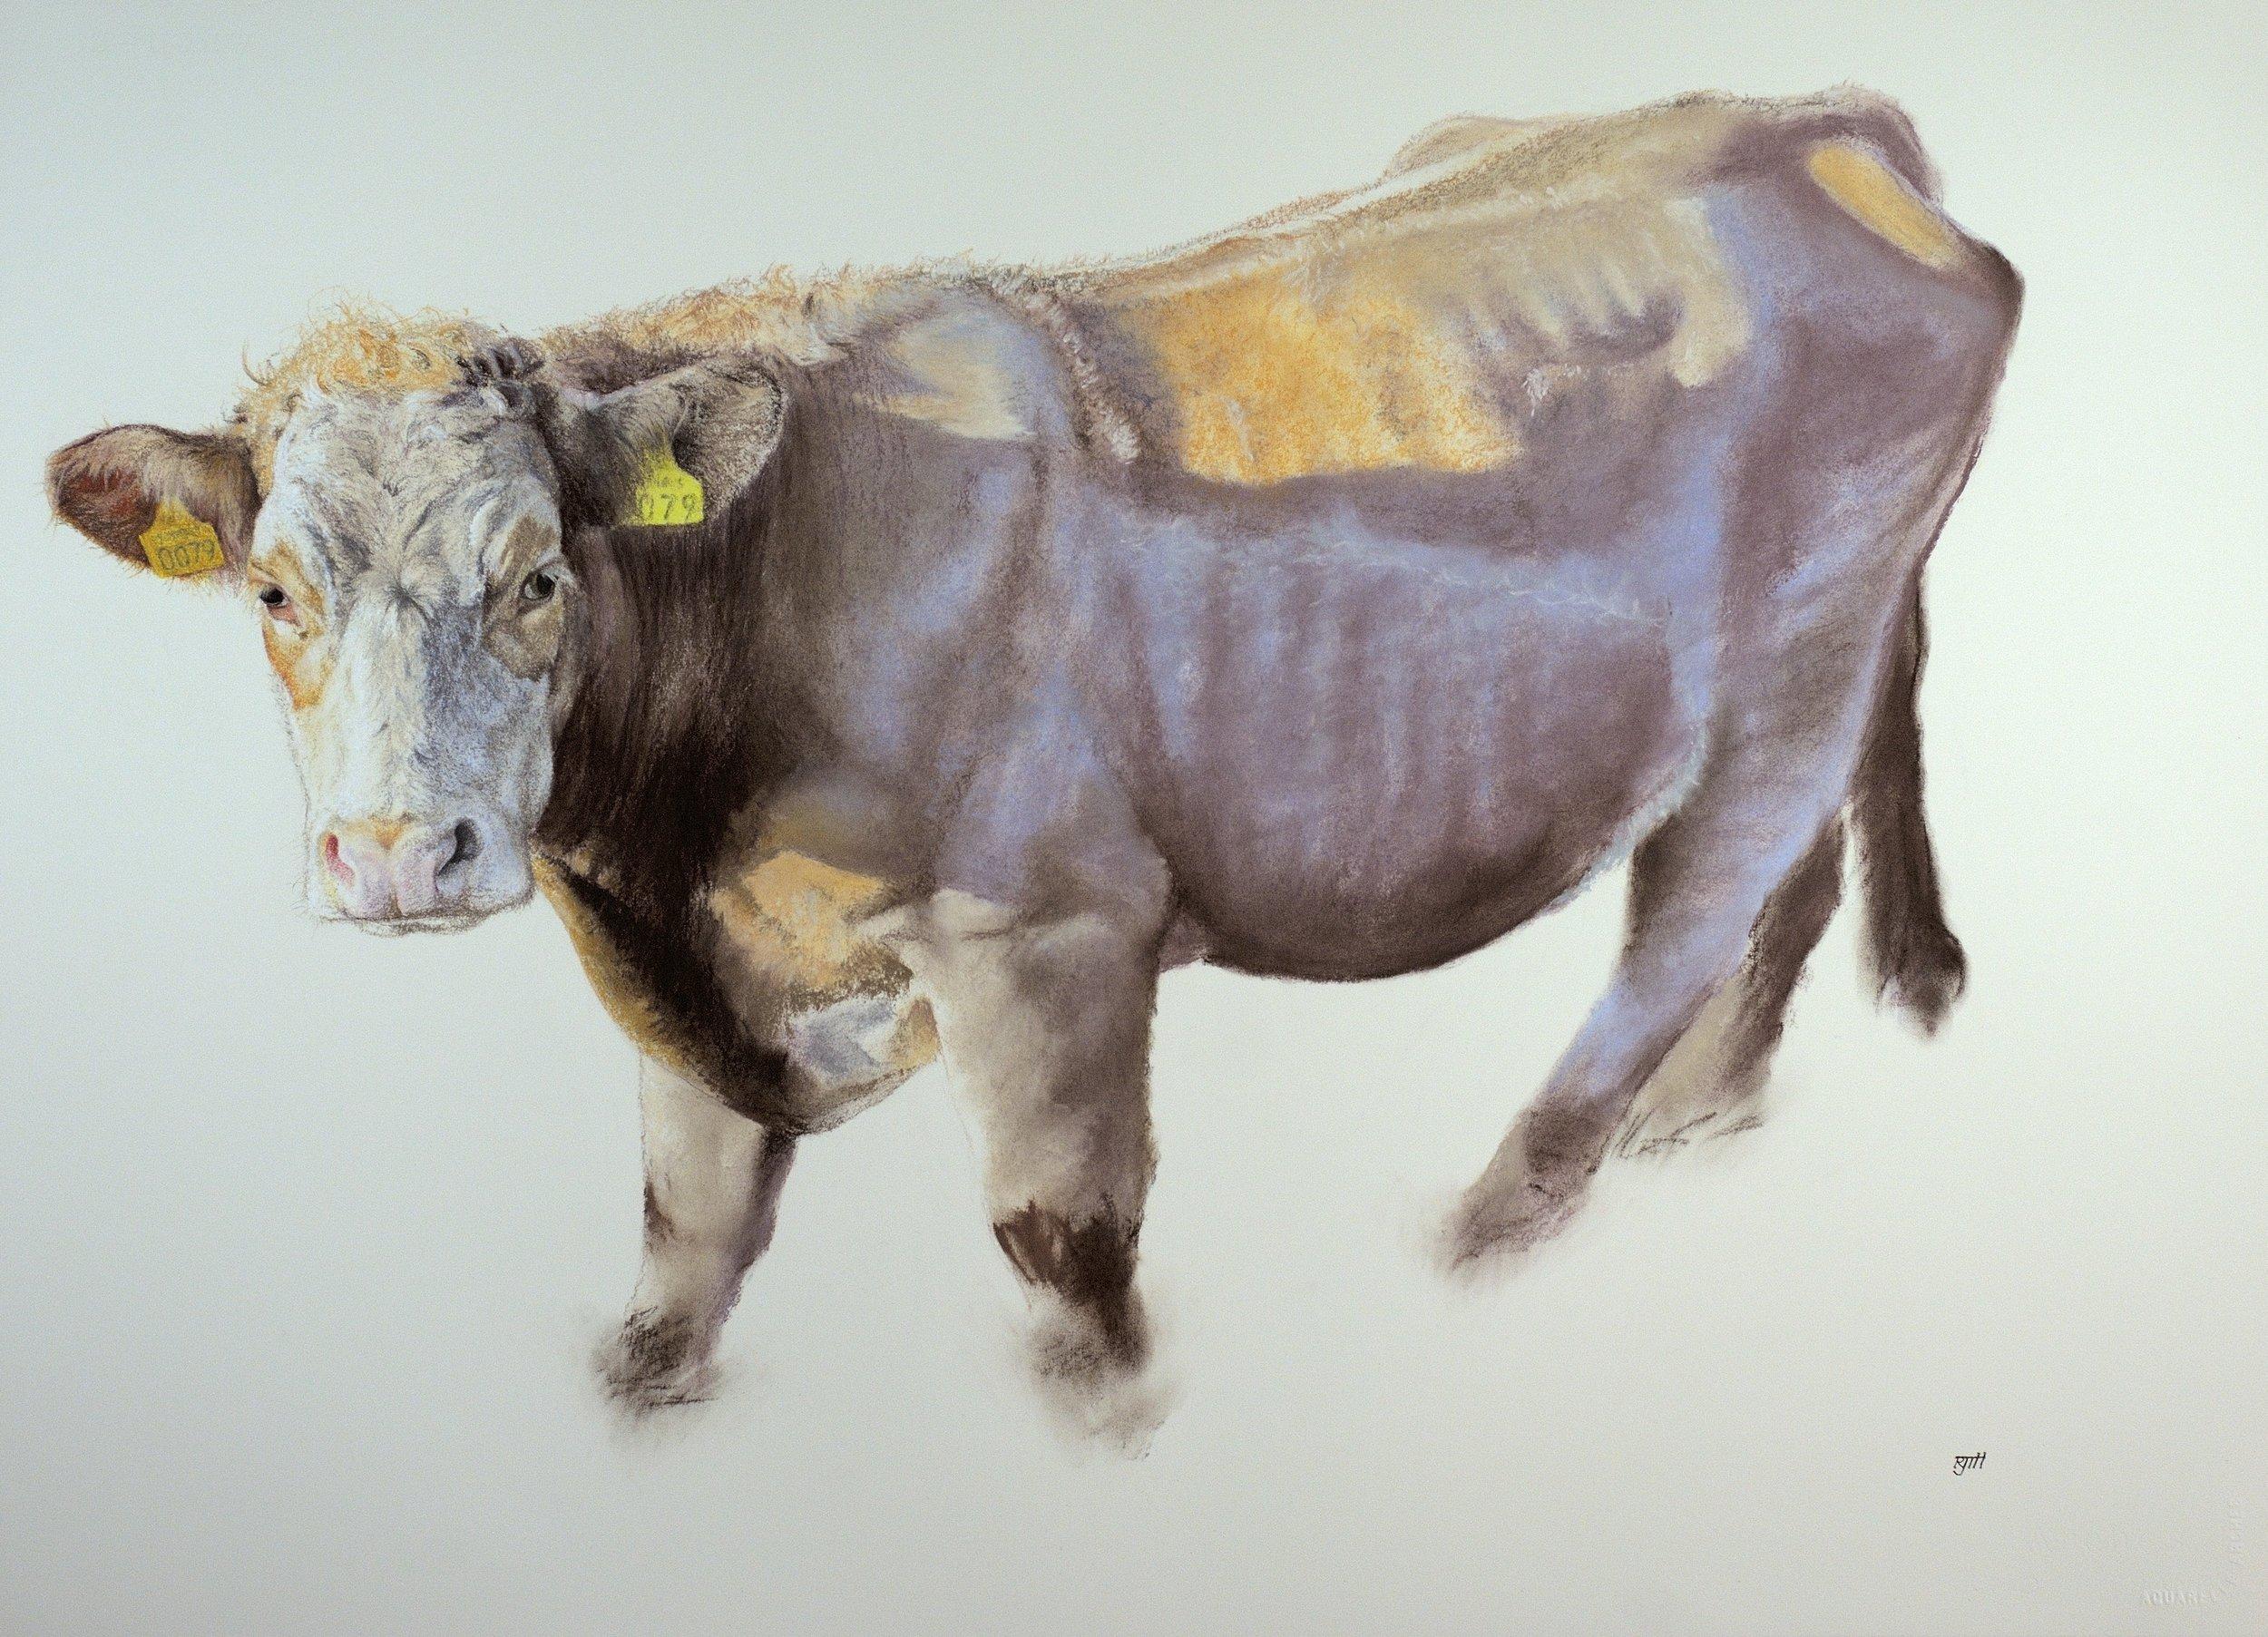 La Vache Qui Ne Rit Pas, 2018, pastel, 23 x 33 in, $4,000